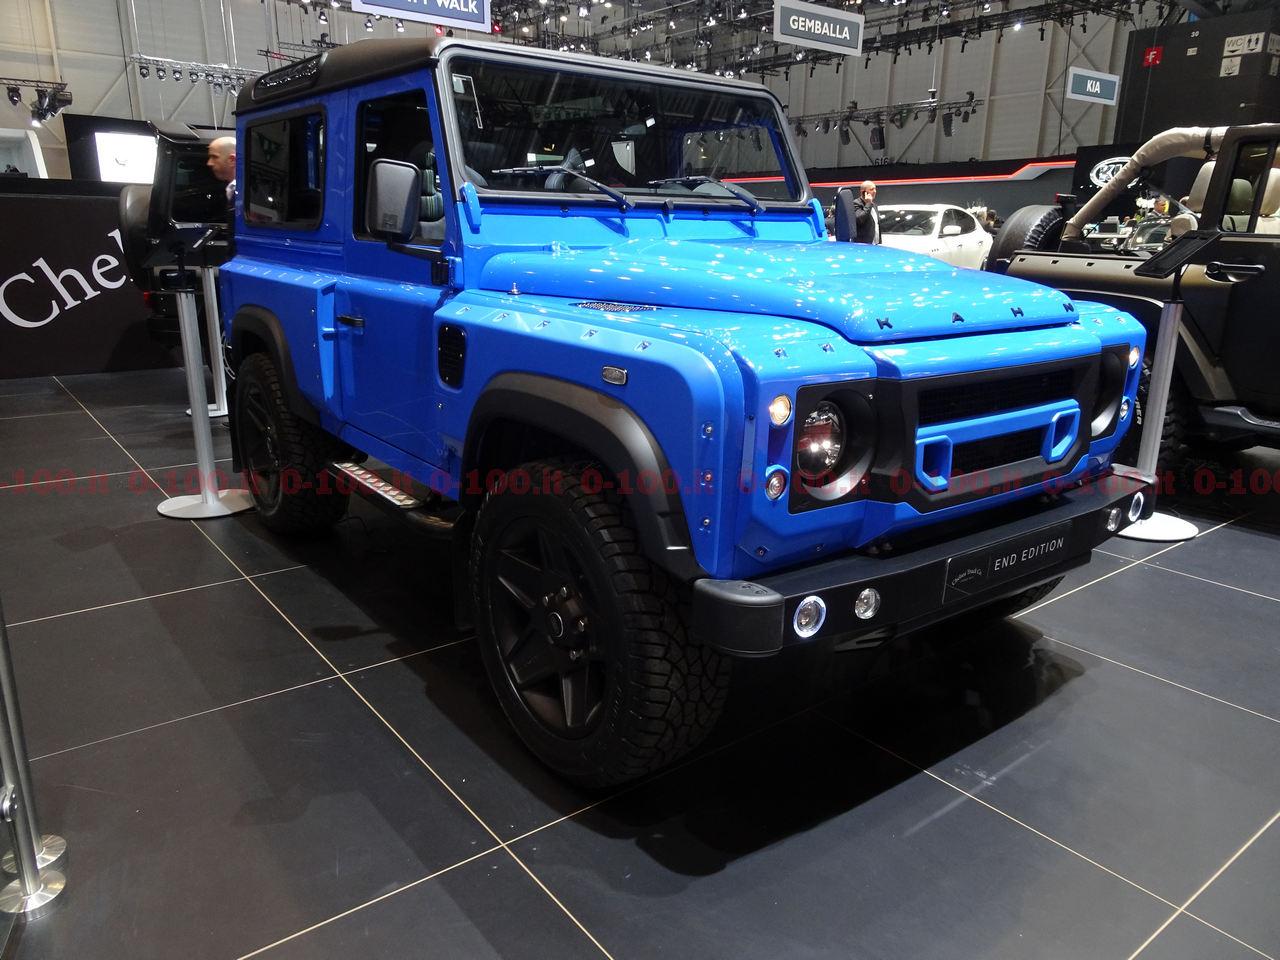 Geneve-ginevra-geneva-2017_tuning-khan-design-chelsea-truck-land-rover-defender_0-100_5